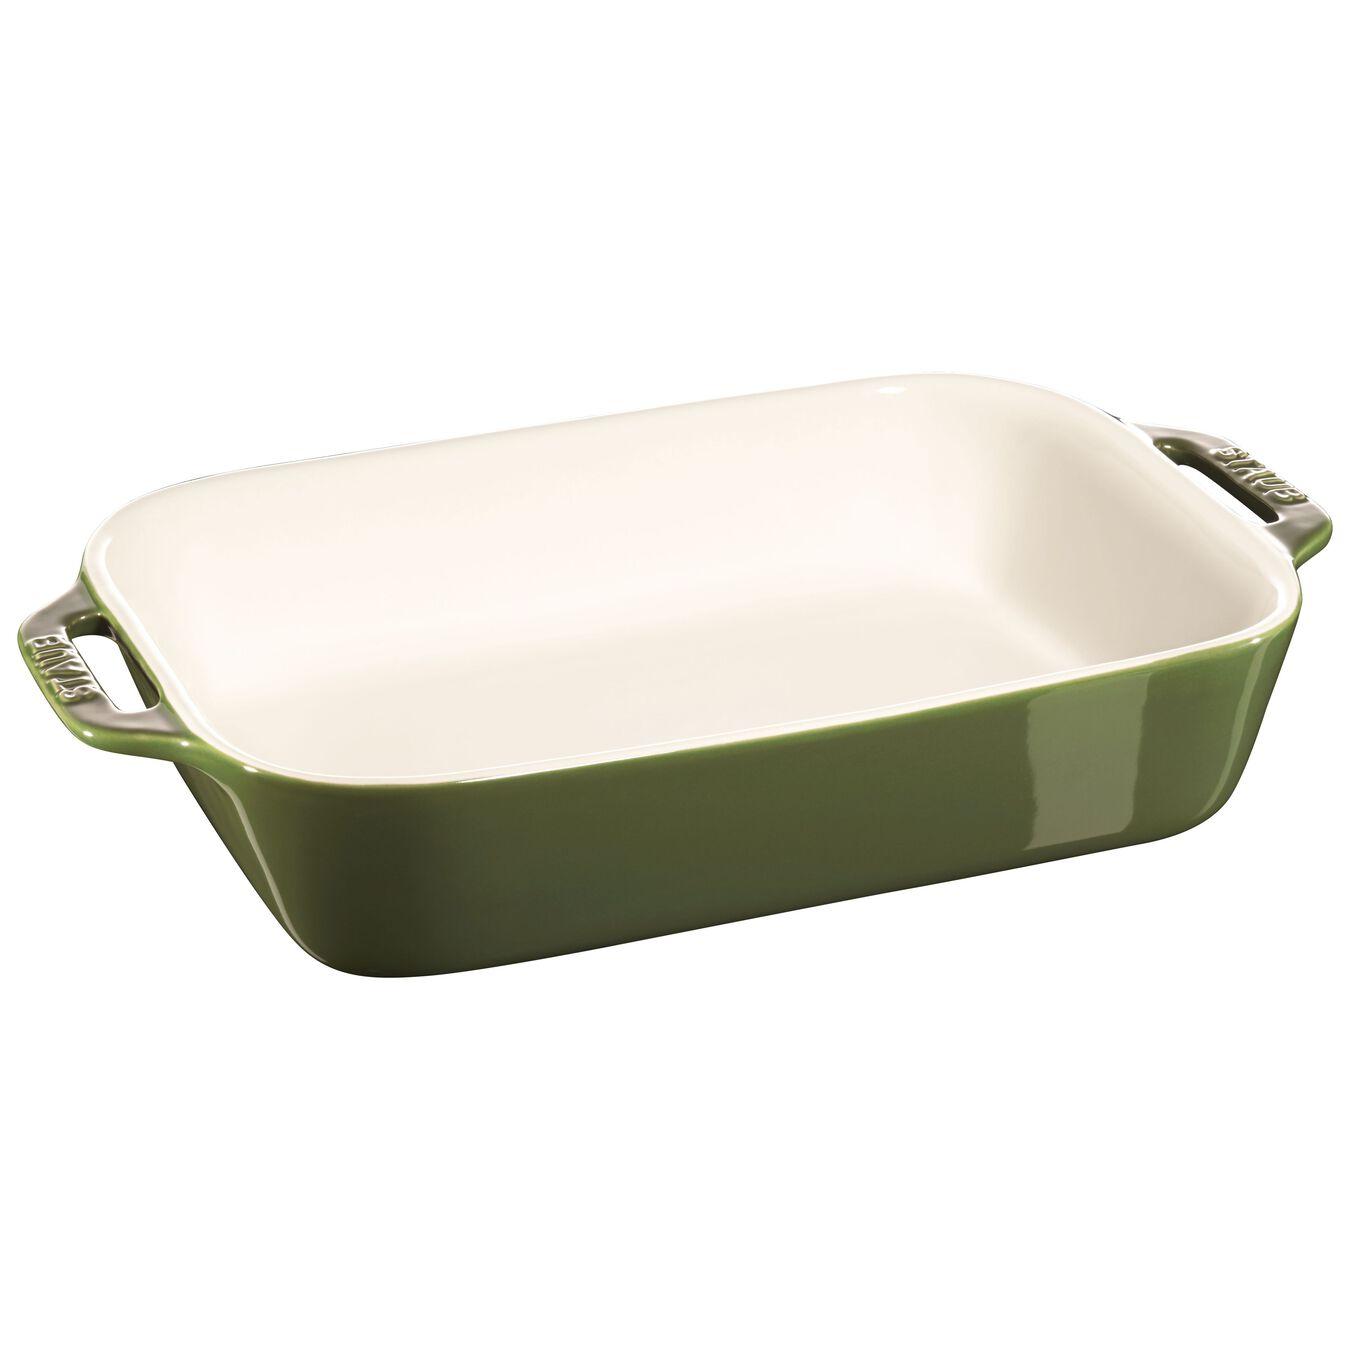 2 Piece rectangular Bakeware set, Basil-Green,,large 2